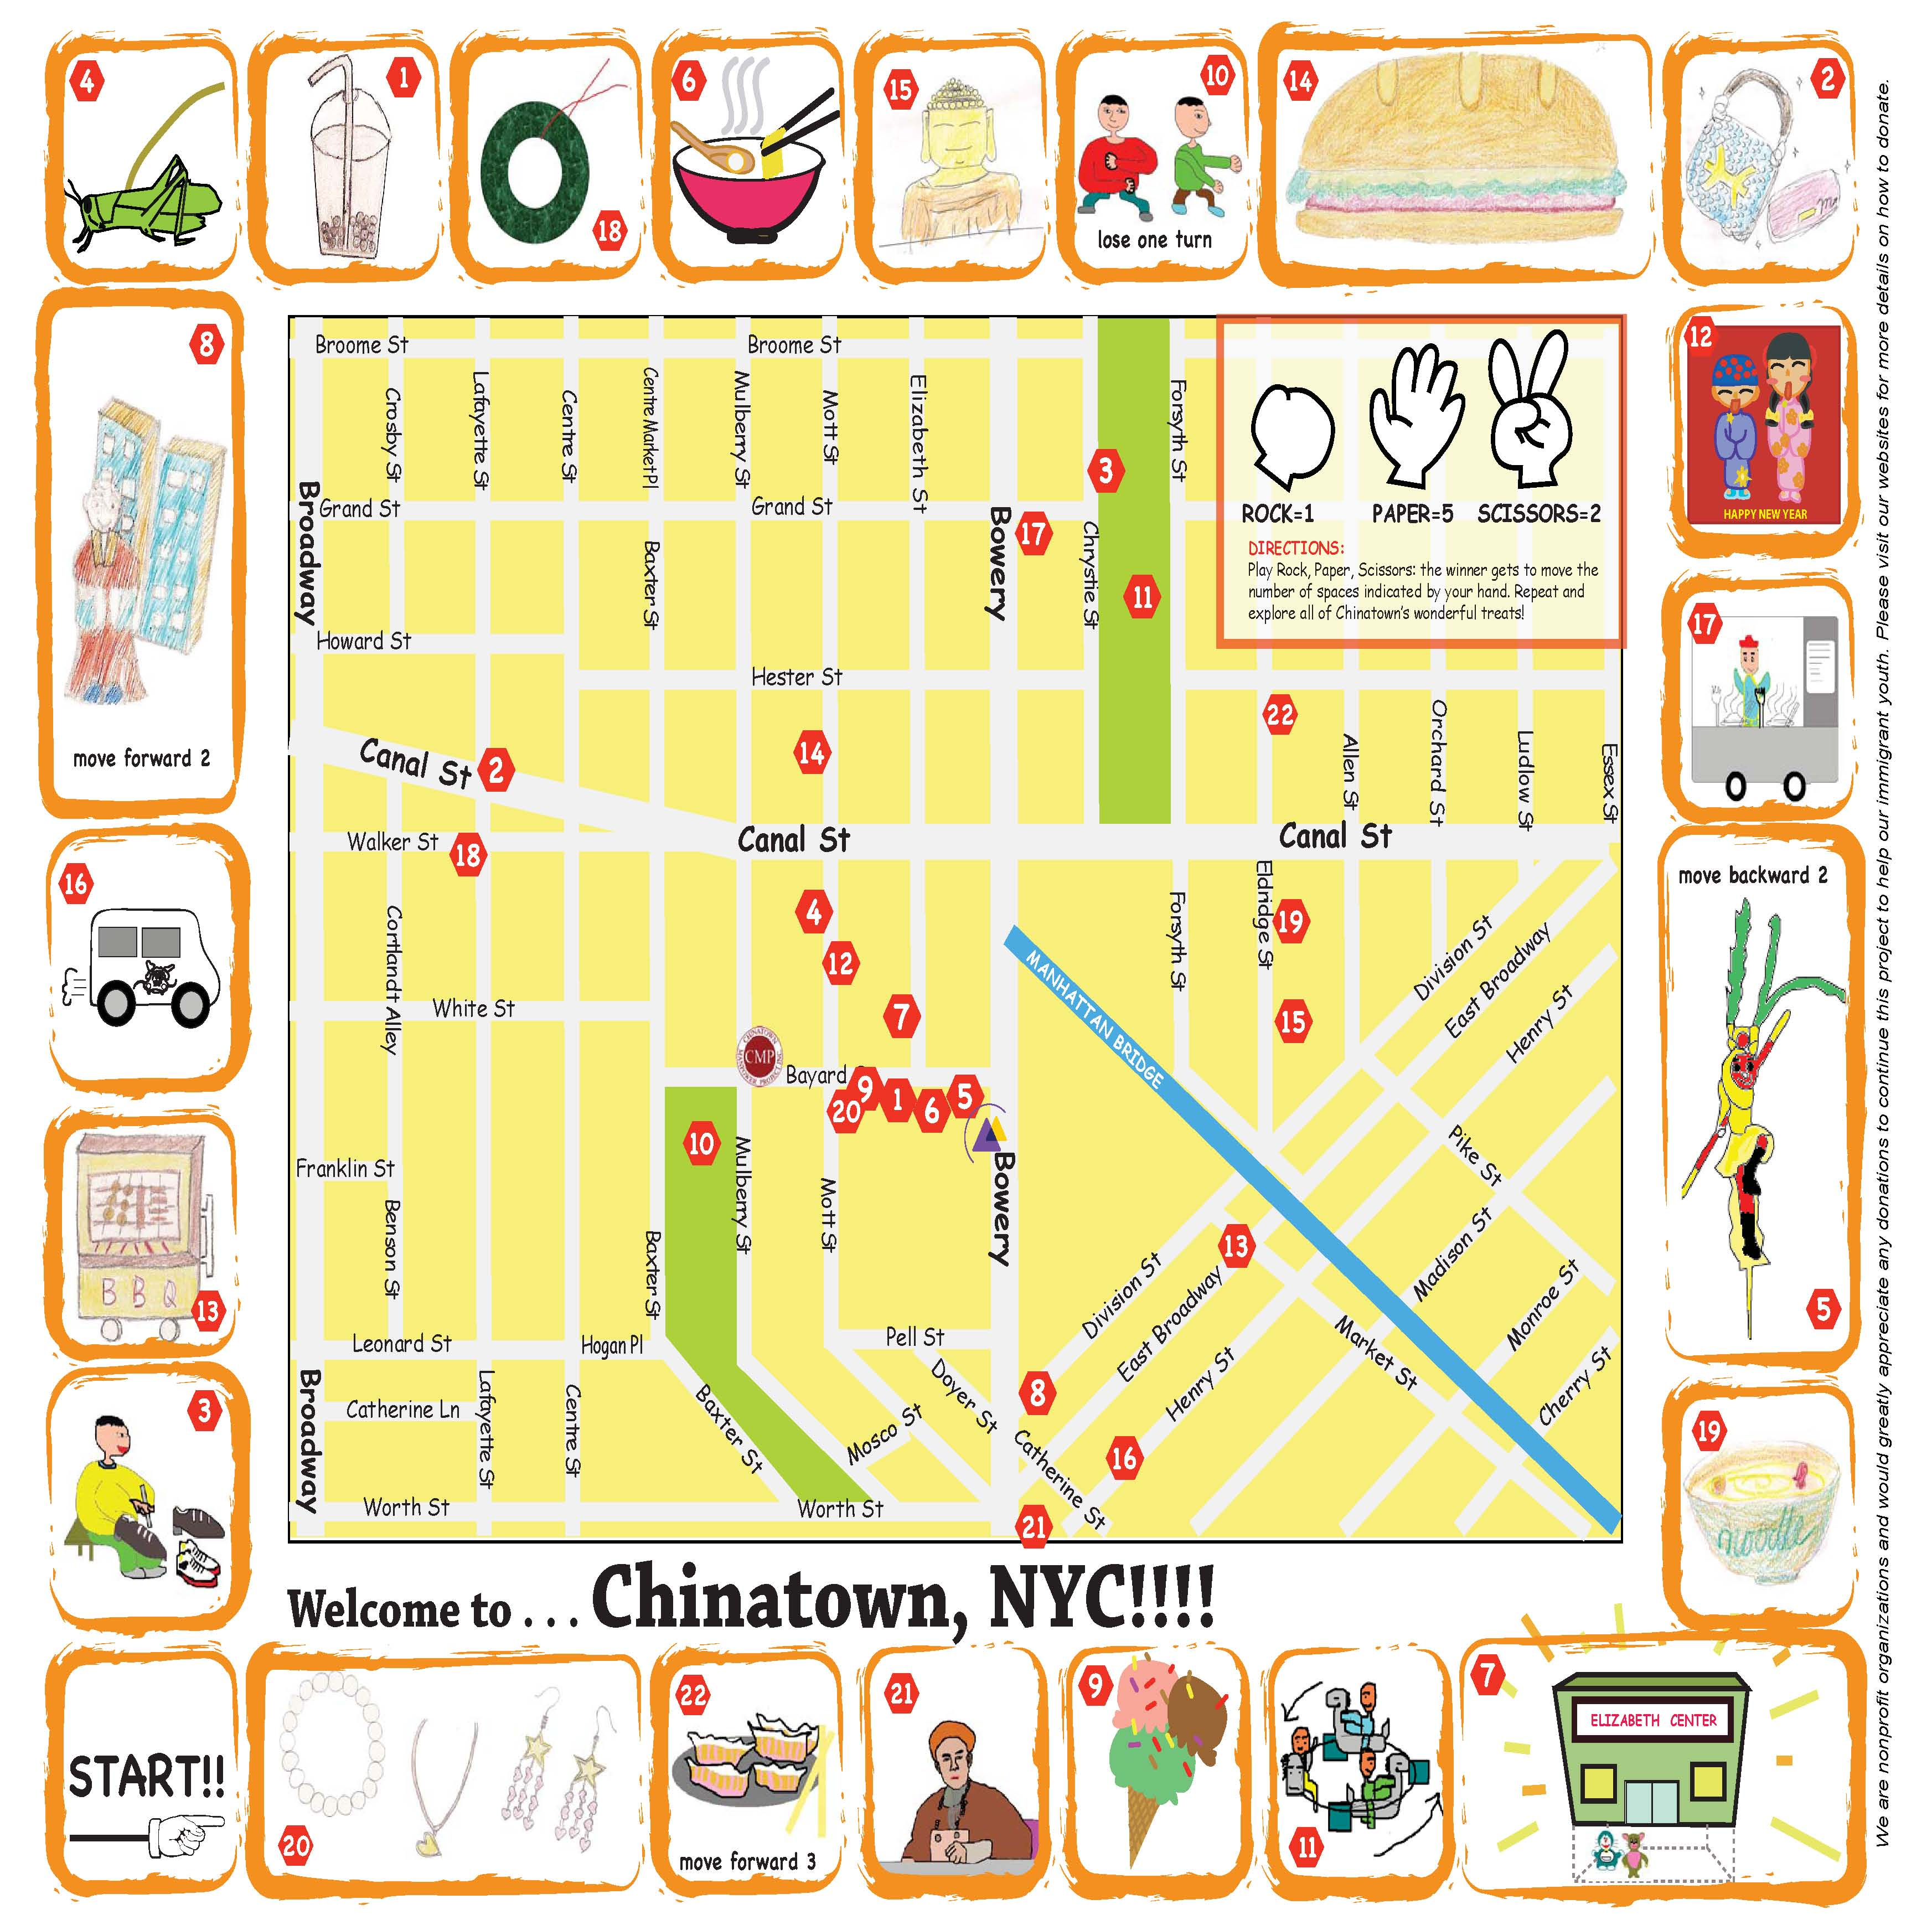 Chinatown New York City Tourist Map City Hall Nyc Mappery